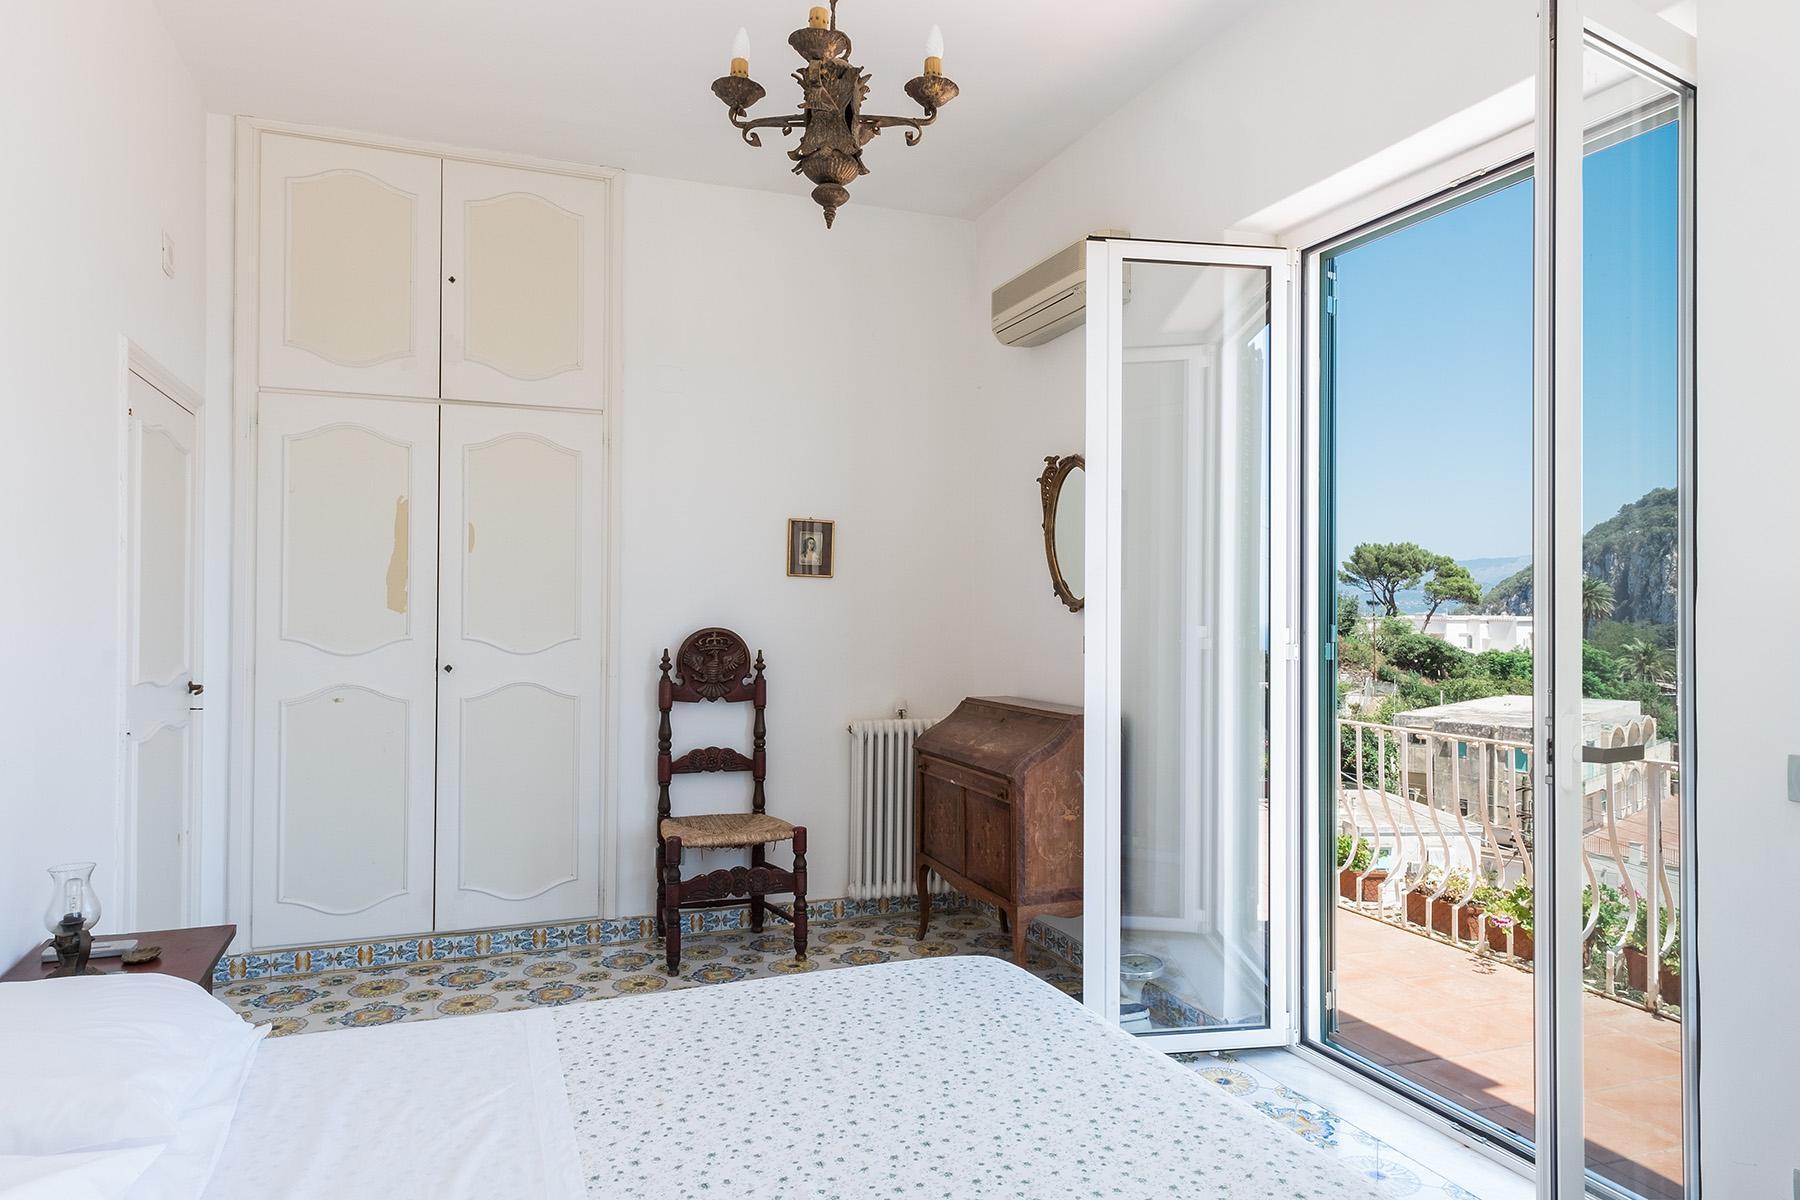 Прекрасная вилла с панорамным видом на море в центре легендарного острова Капри, Италия - 14